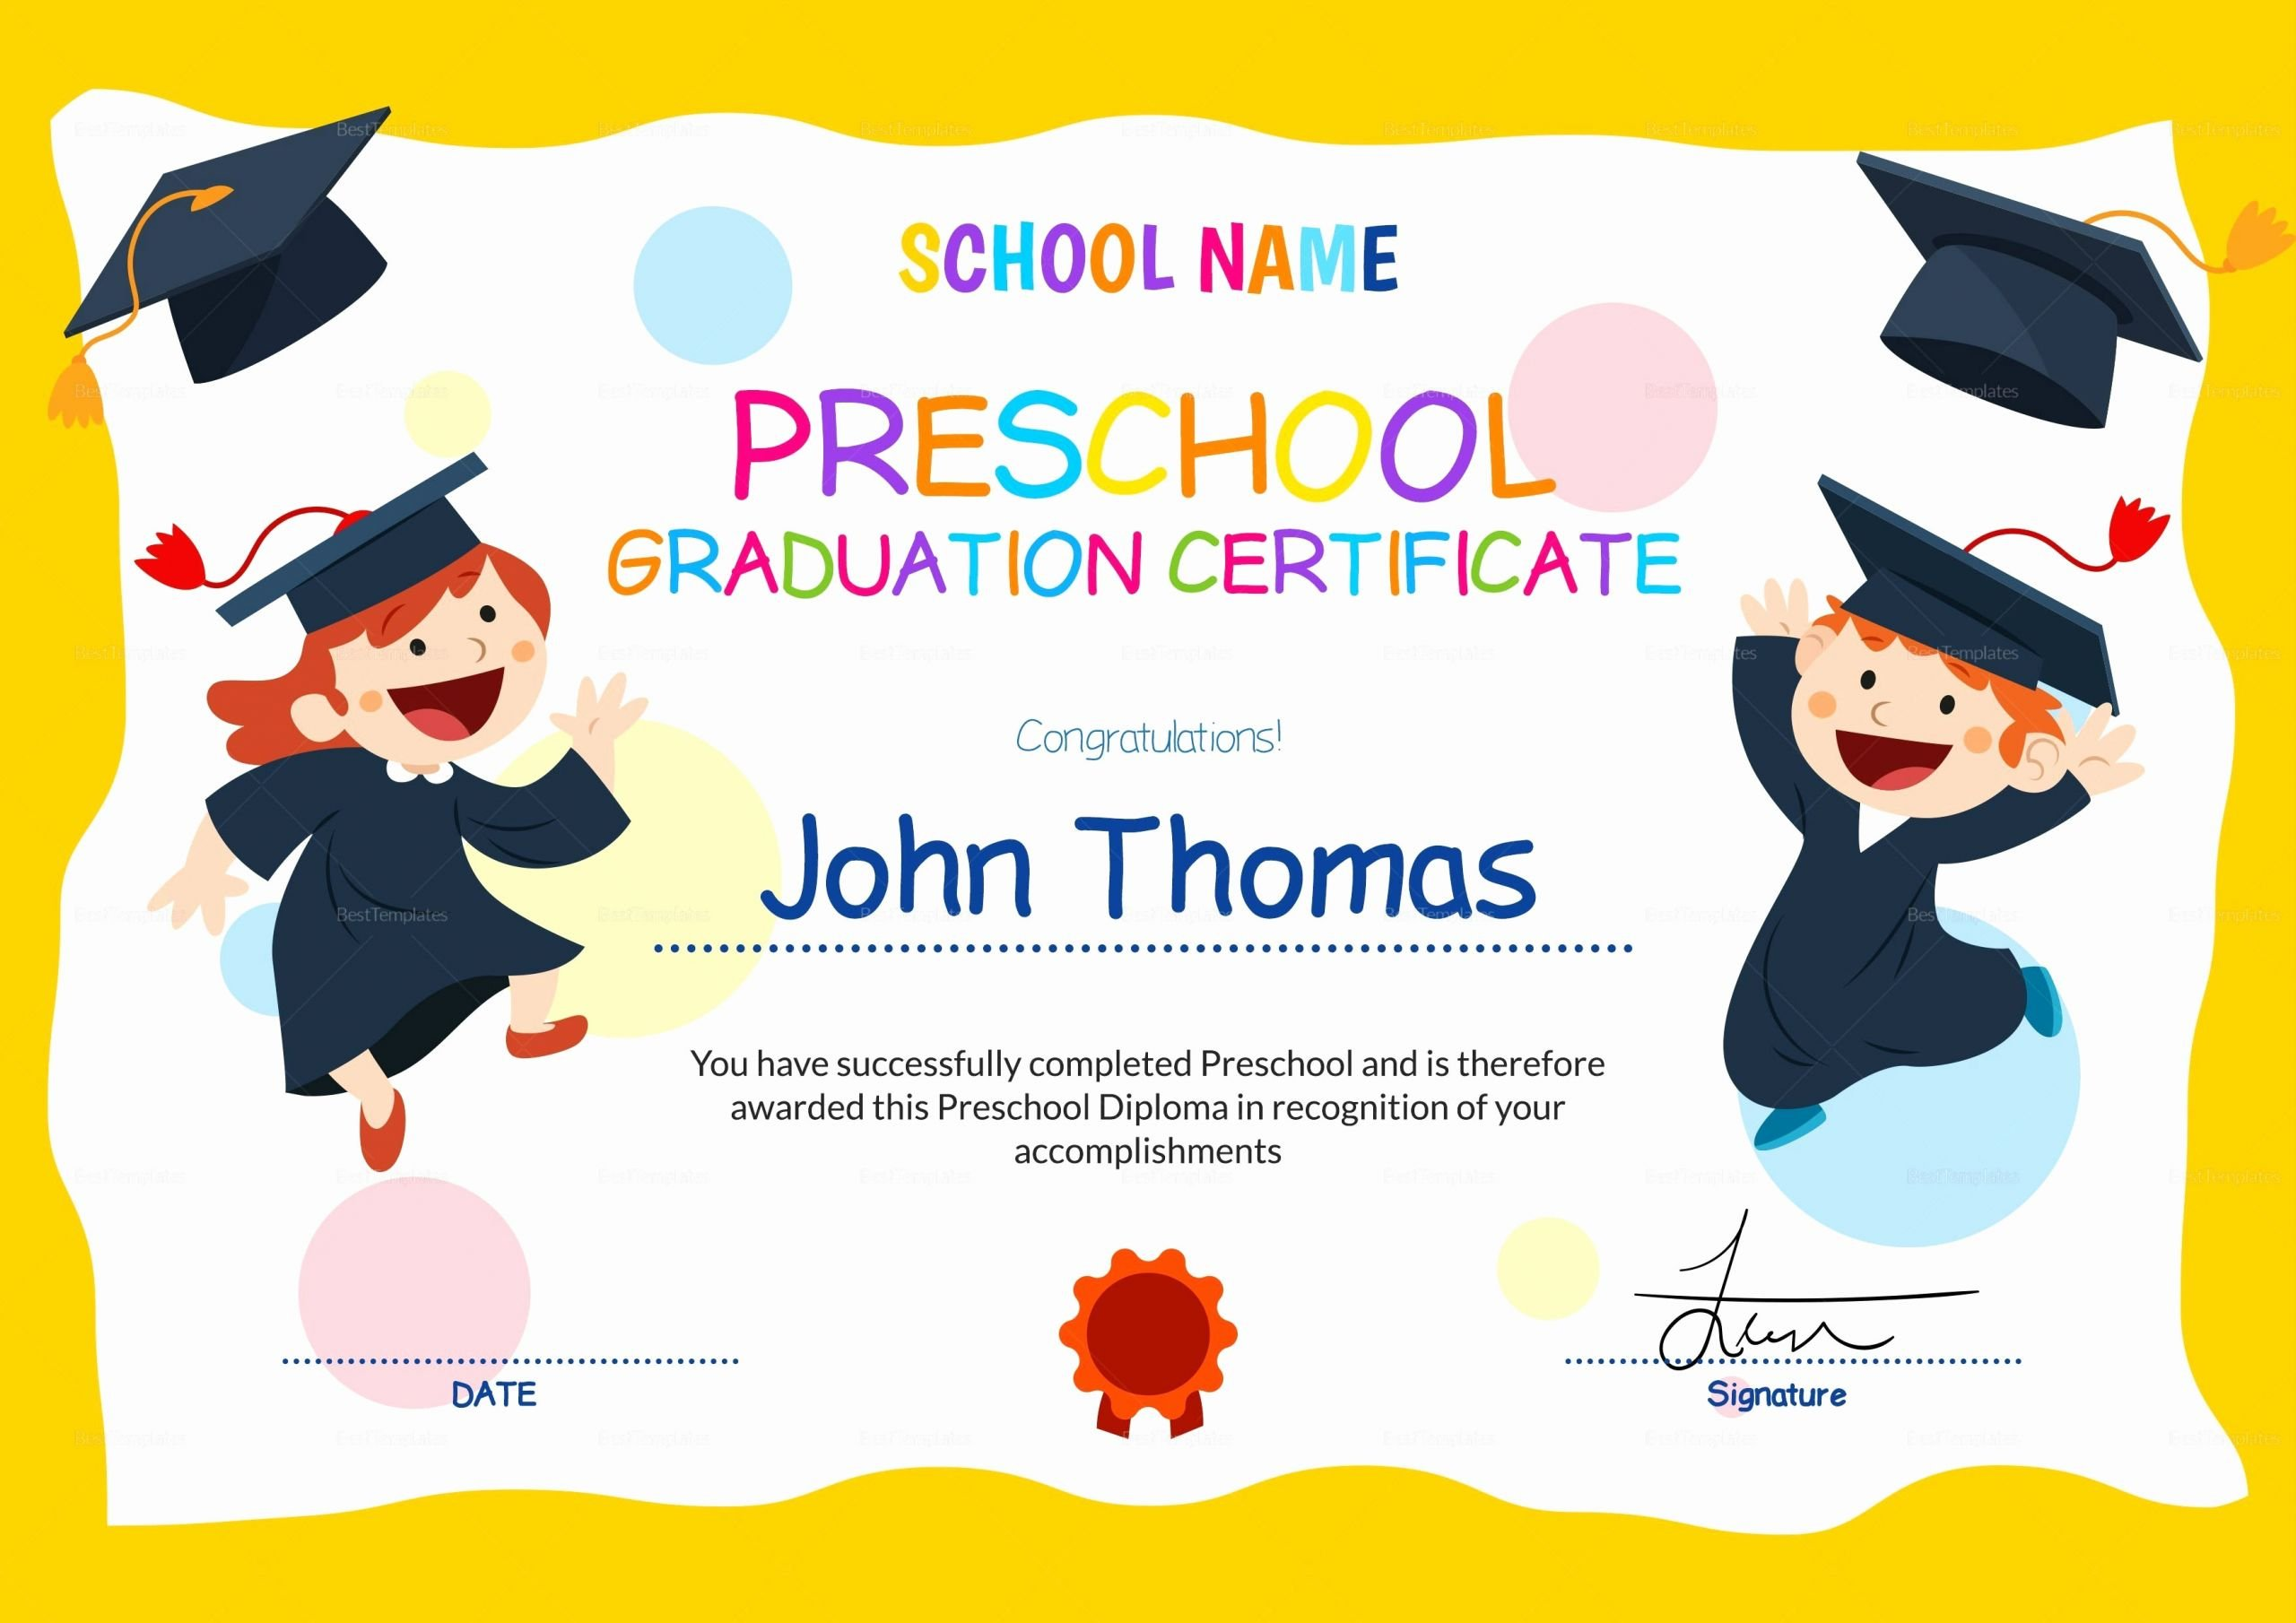 Preschool Graduation Certificate Template New 11 Preschool Certificate Templates Pdf